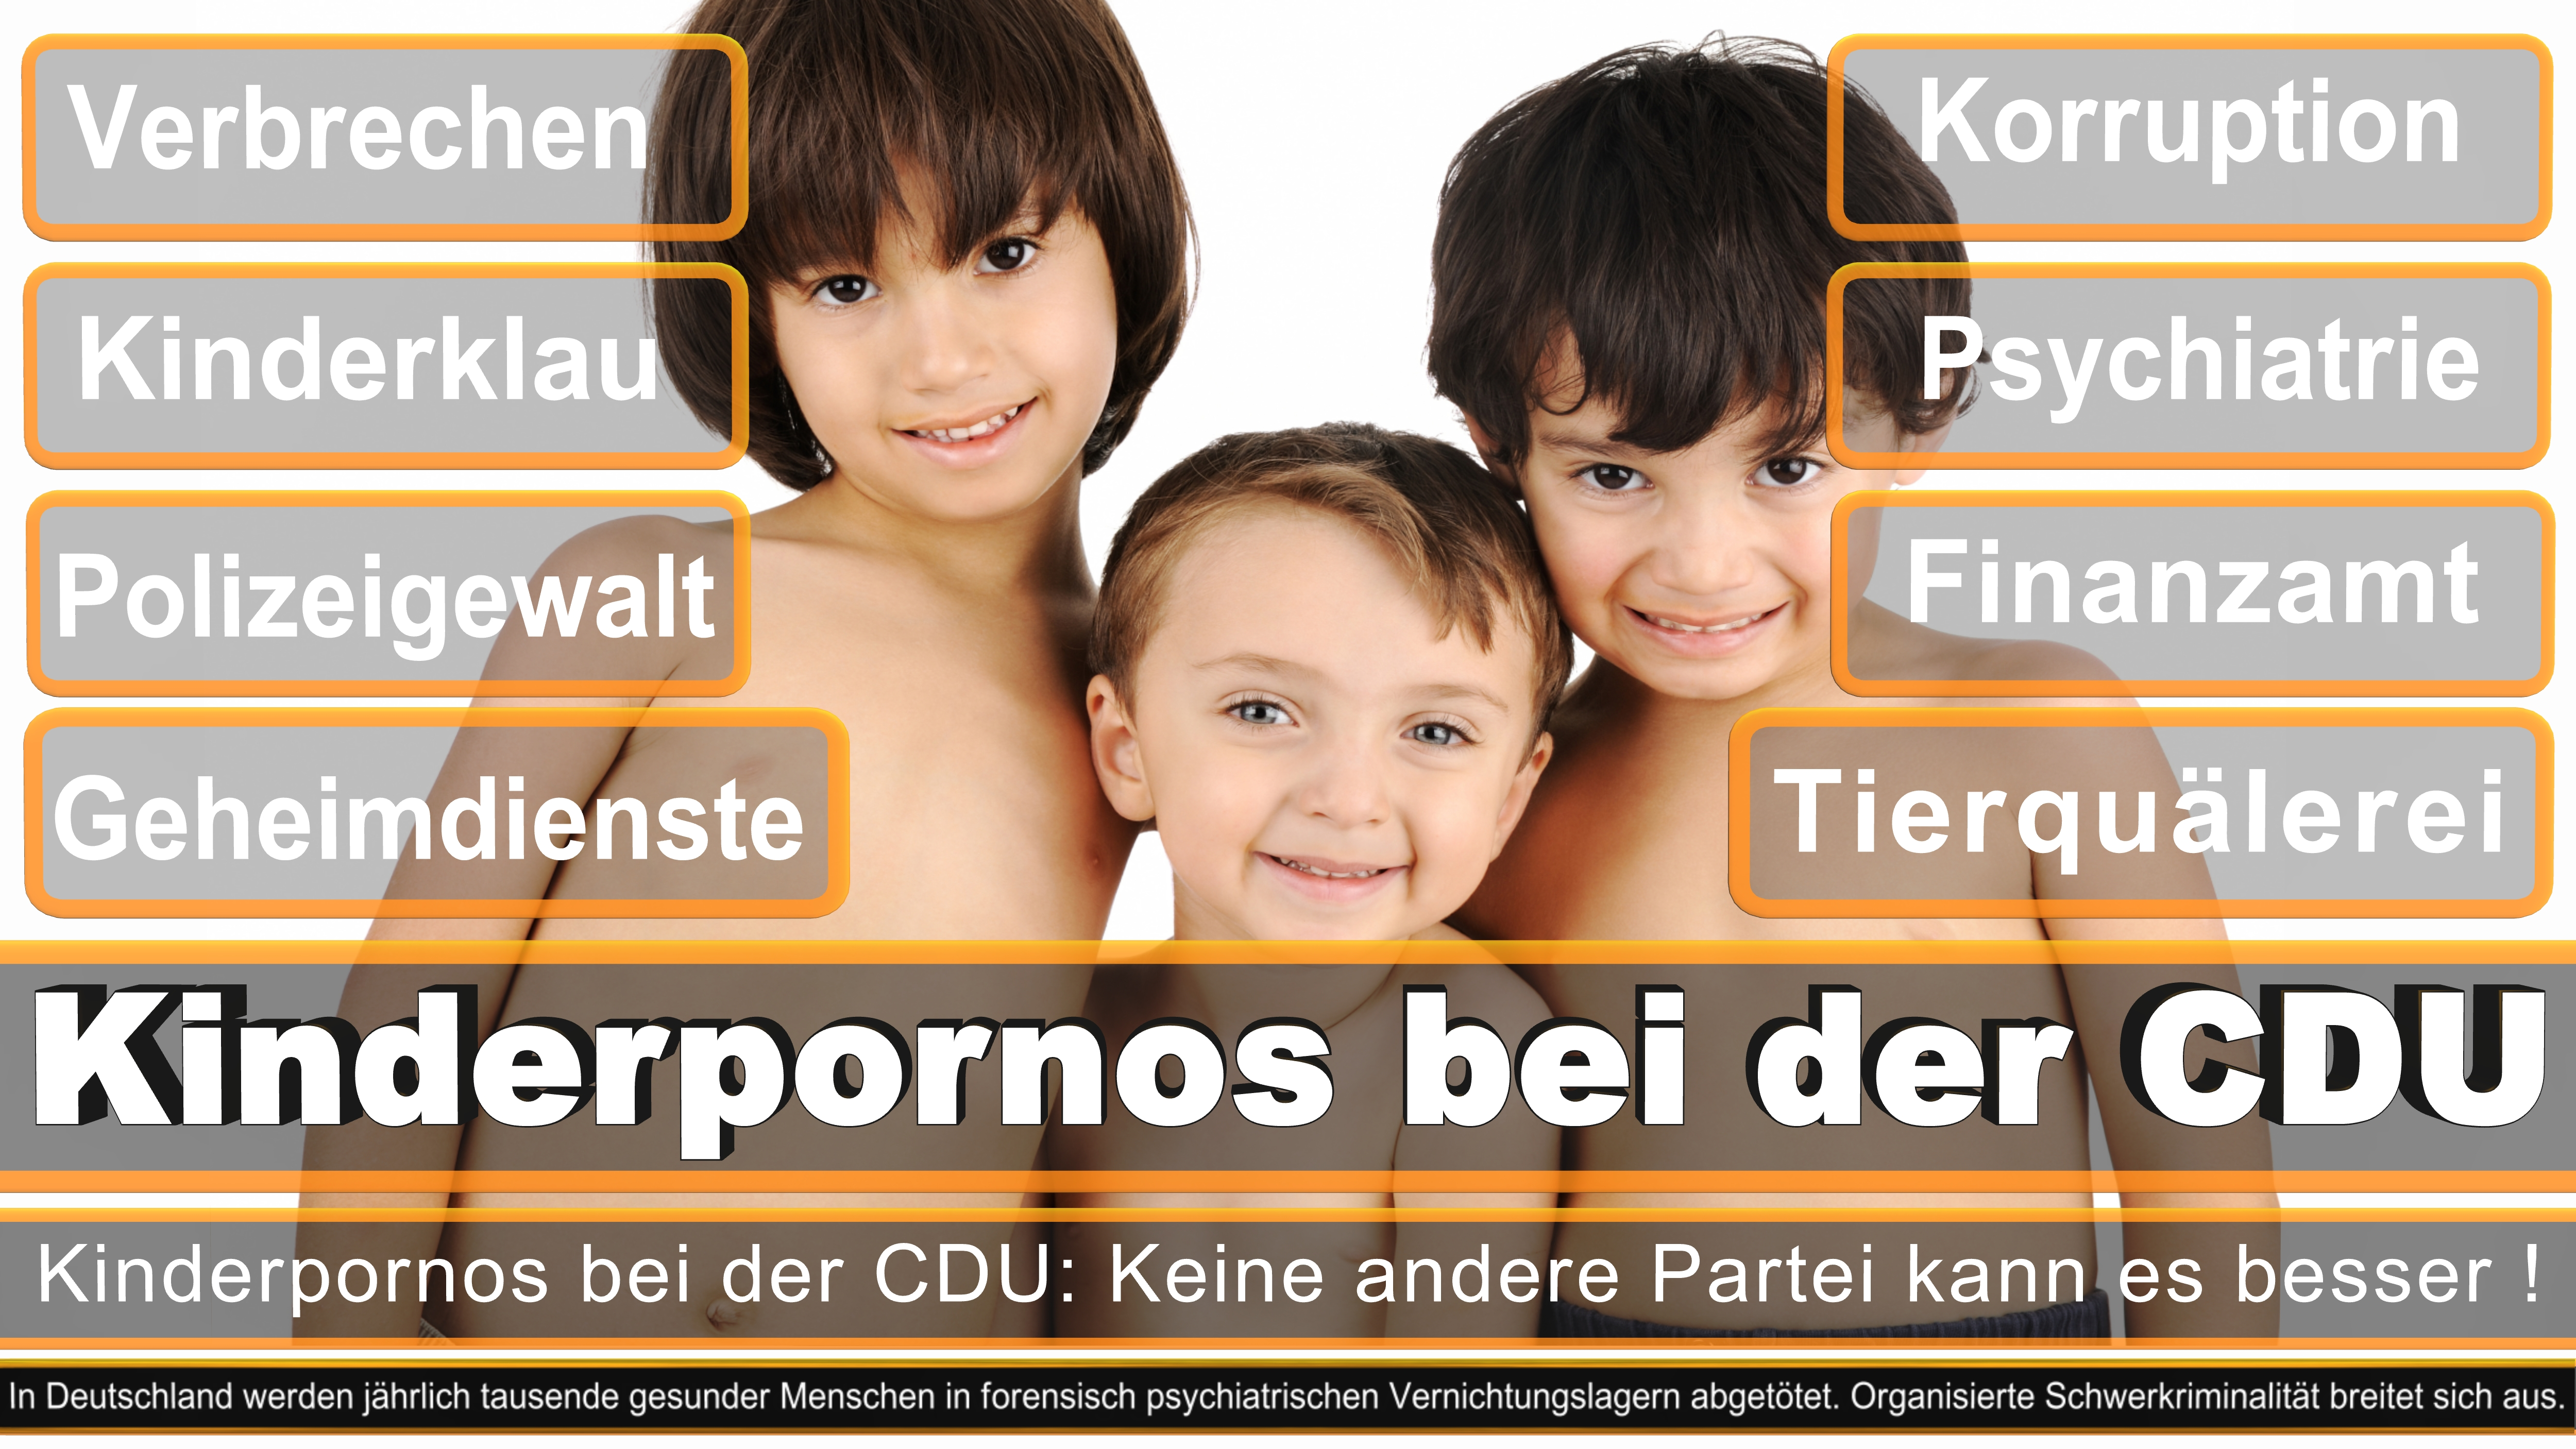 CDU Bielefeld, Ortverband, Fraktion, Rat, Ratsmitglieder, Vorstand (2)